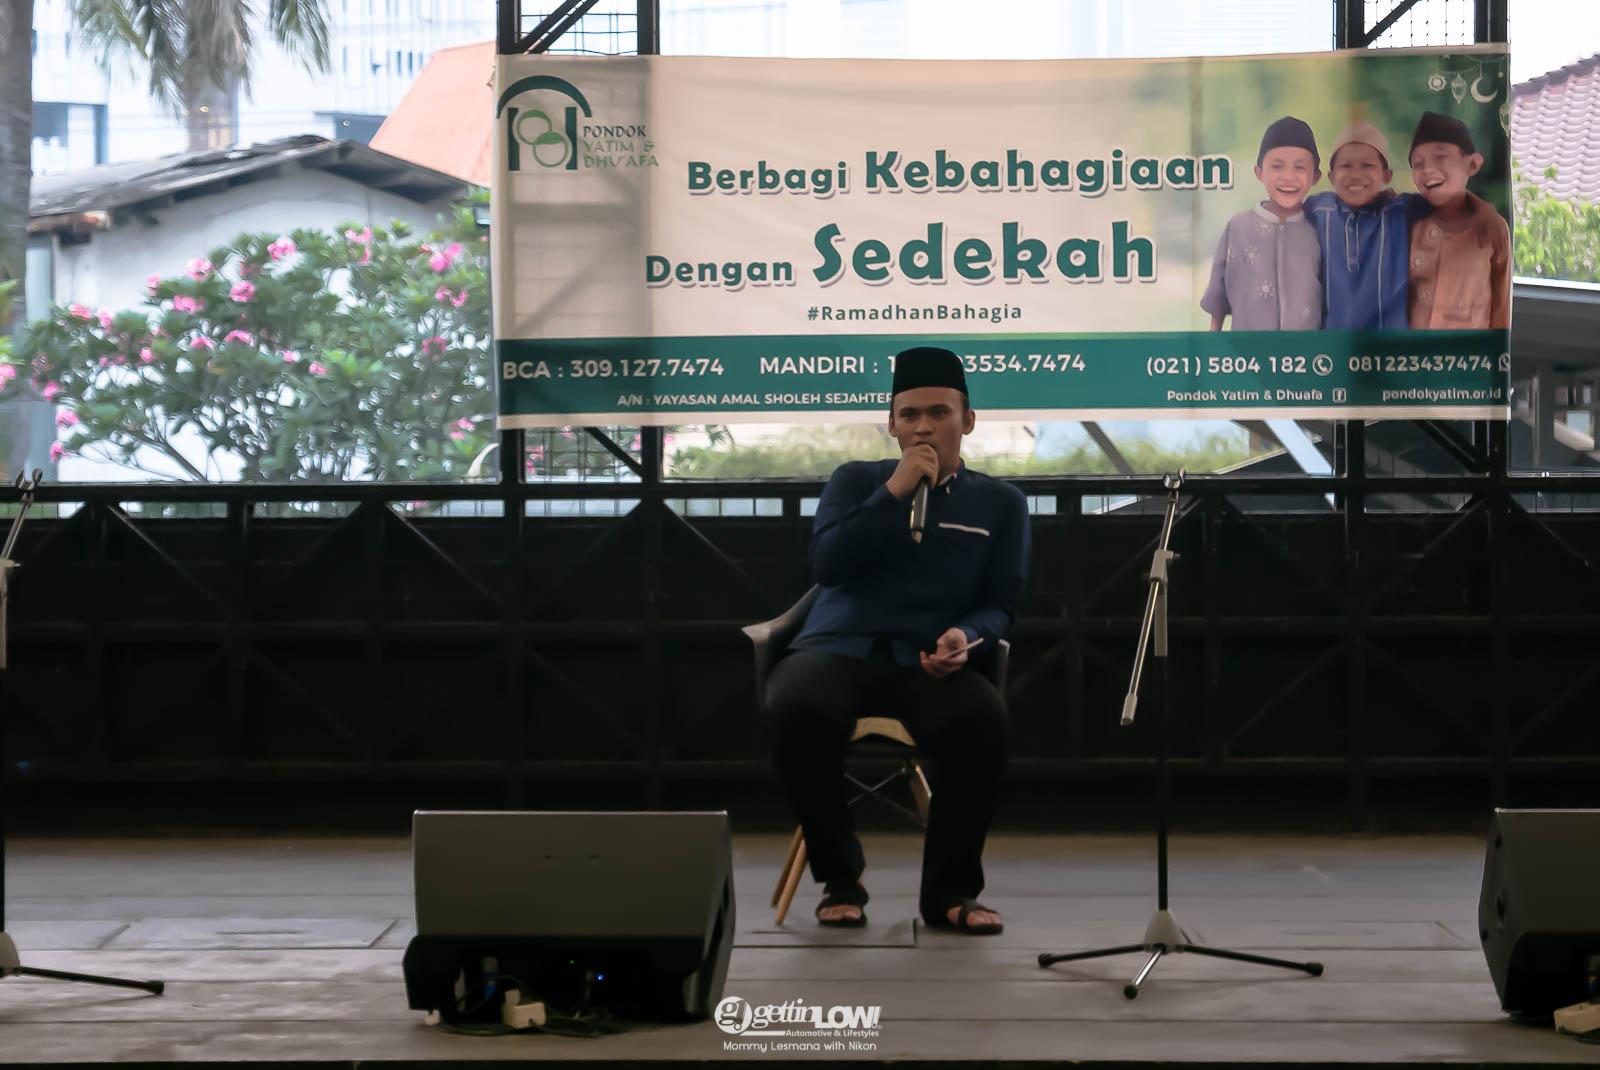 indonesian honda estilo meet in ramadhan